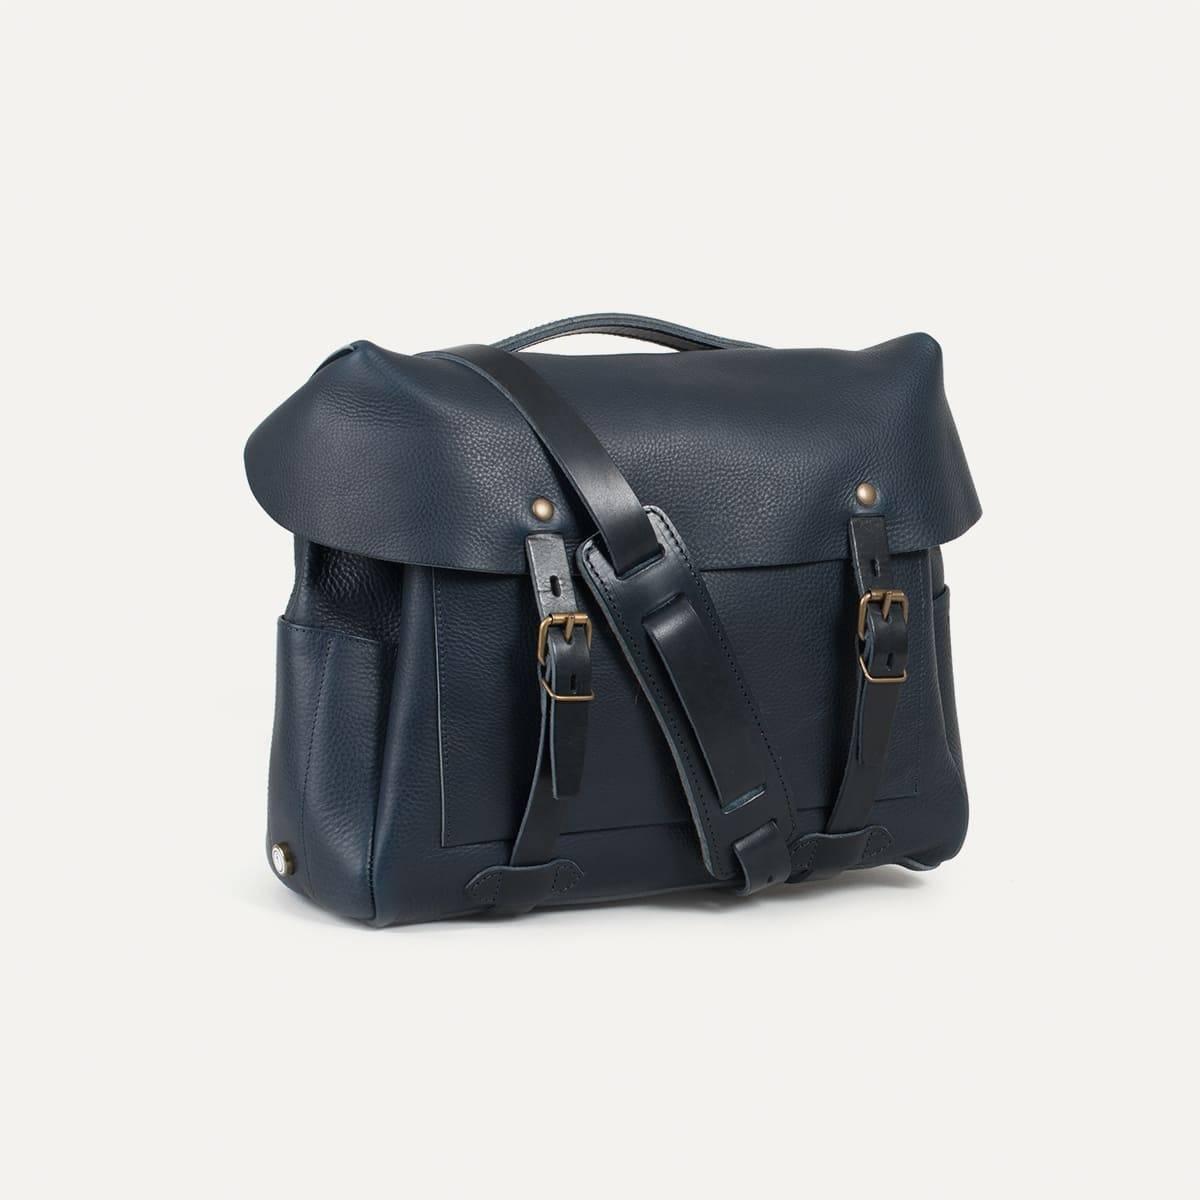 Bleu de Chauffe x Blitz Eclair bag - Navy (image n°3)